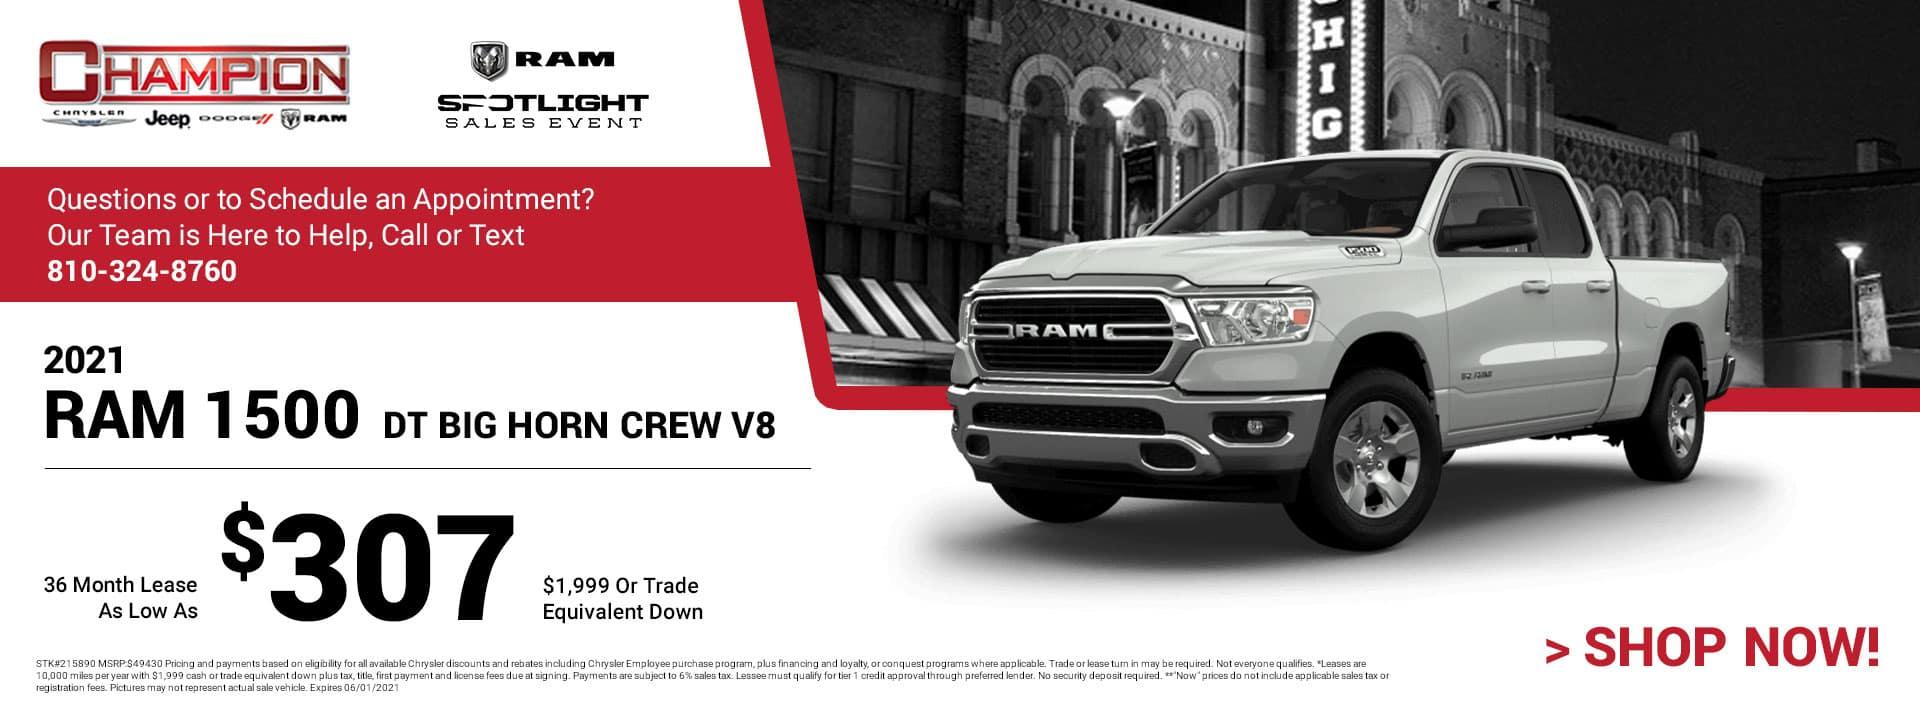 2021 Ram 1500 DT Big Horn Crew V8 215890 $49,430 $1,999 or Trade Equivalent Down 36 $307